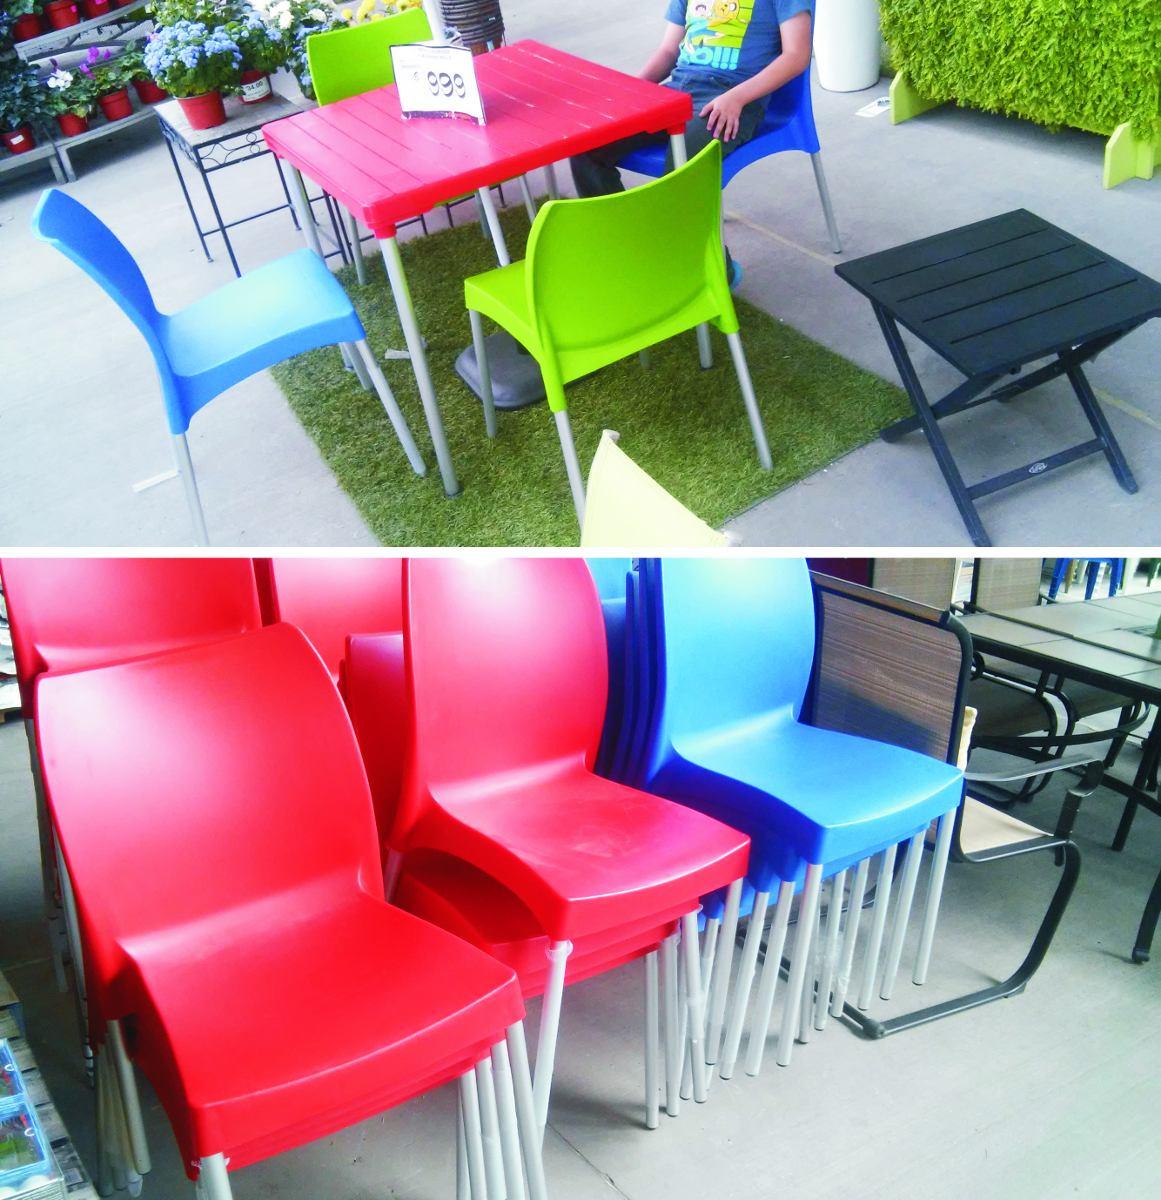 Silla para casa jardin bar cafe restaurante apilable for Casa jardin restaurante